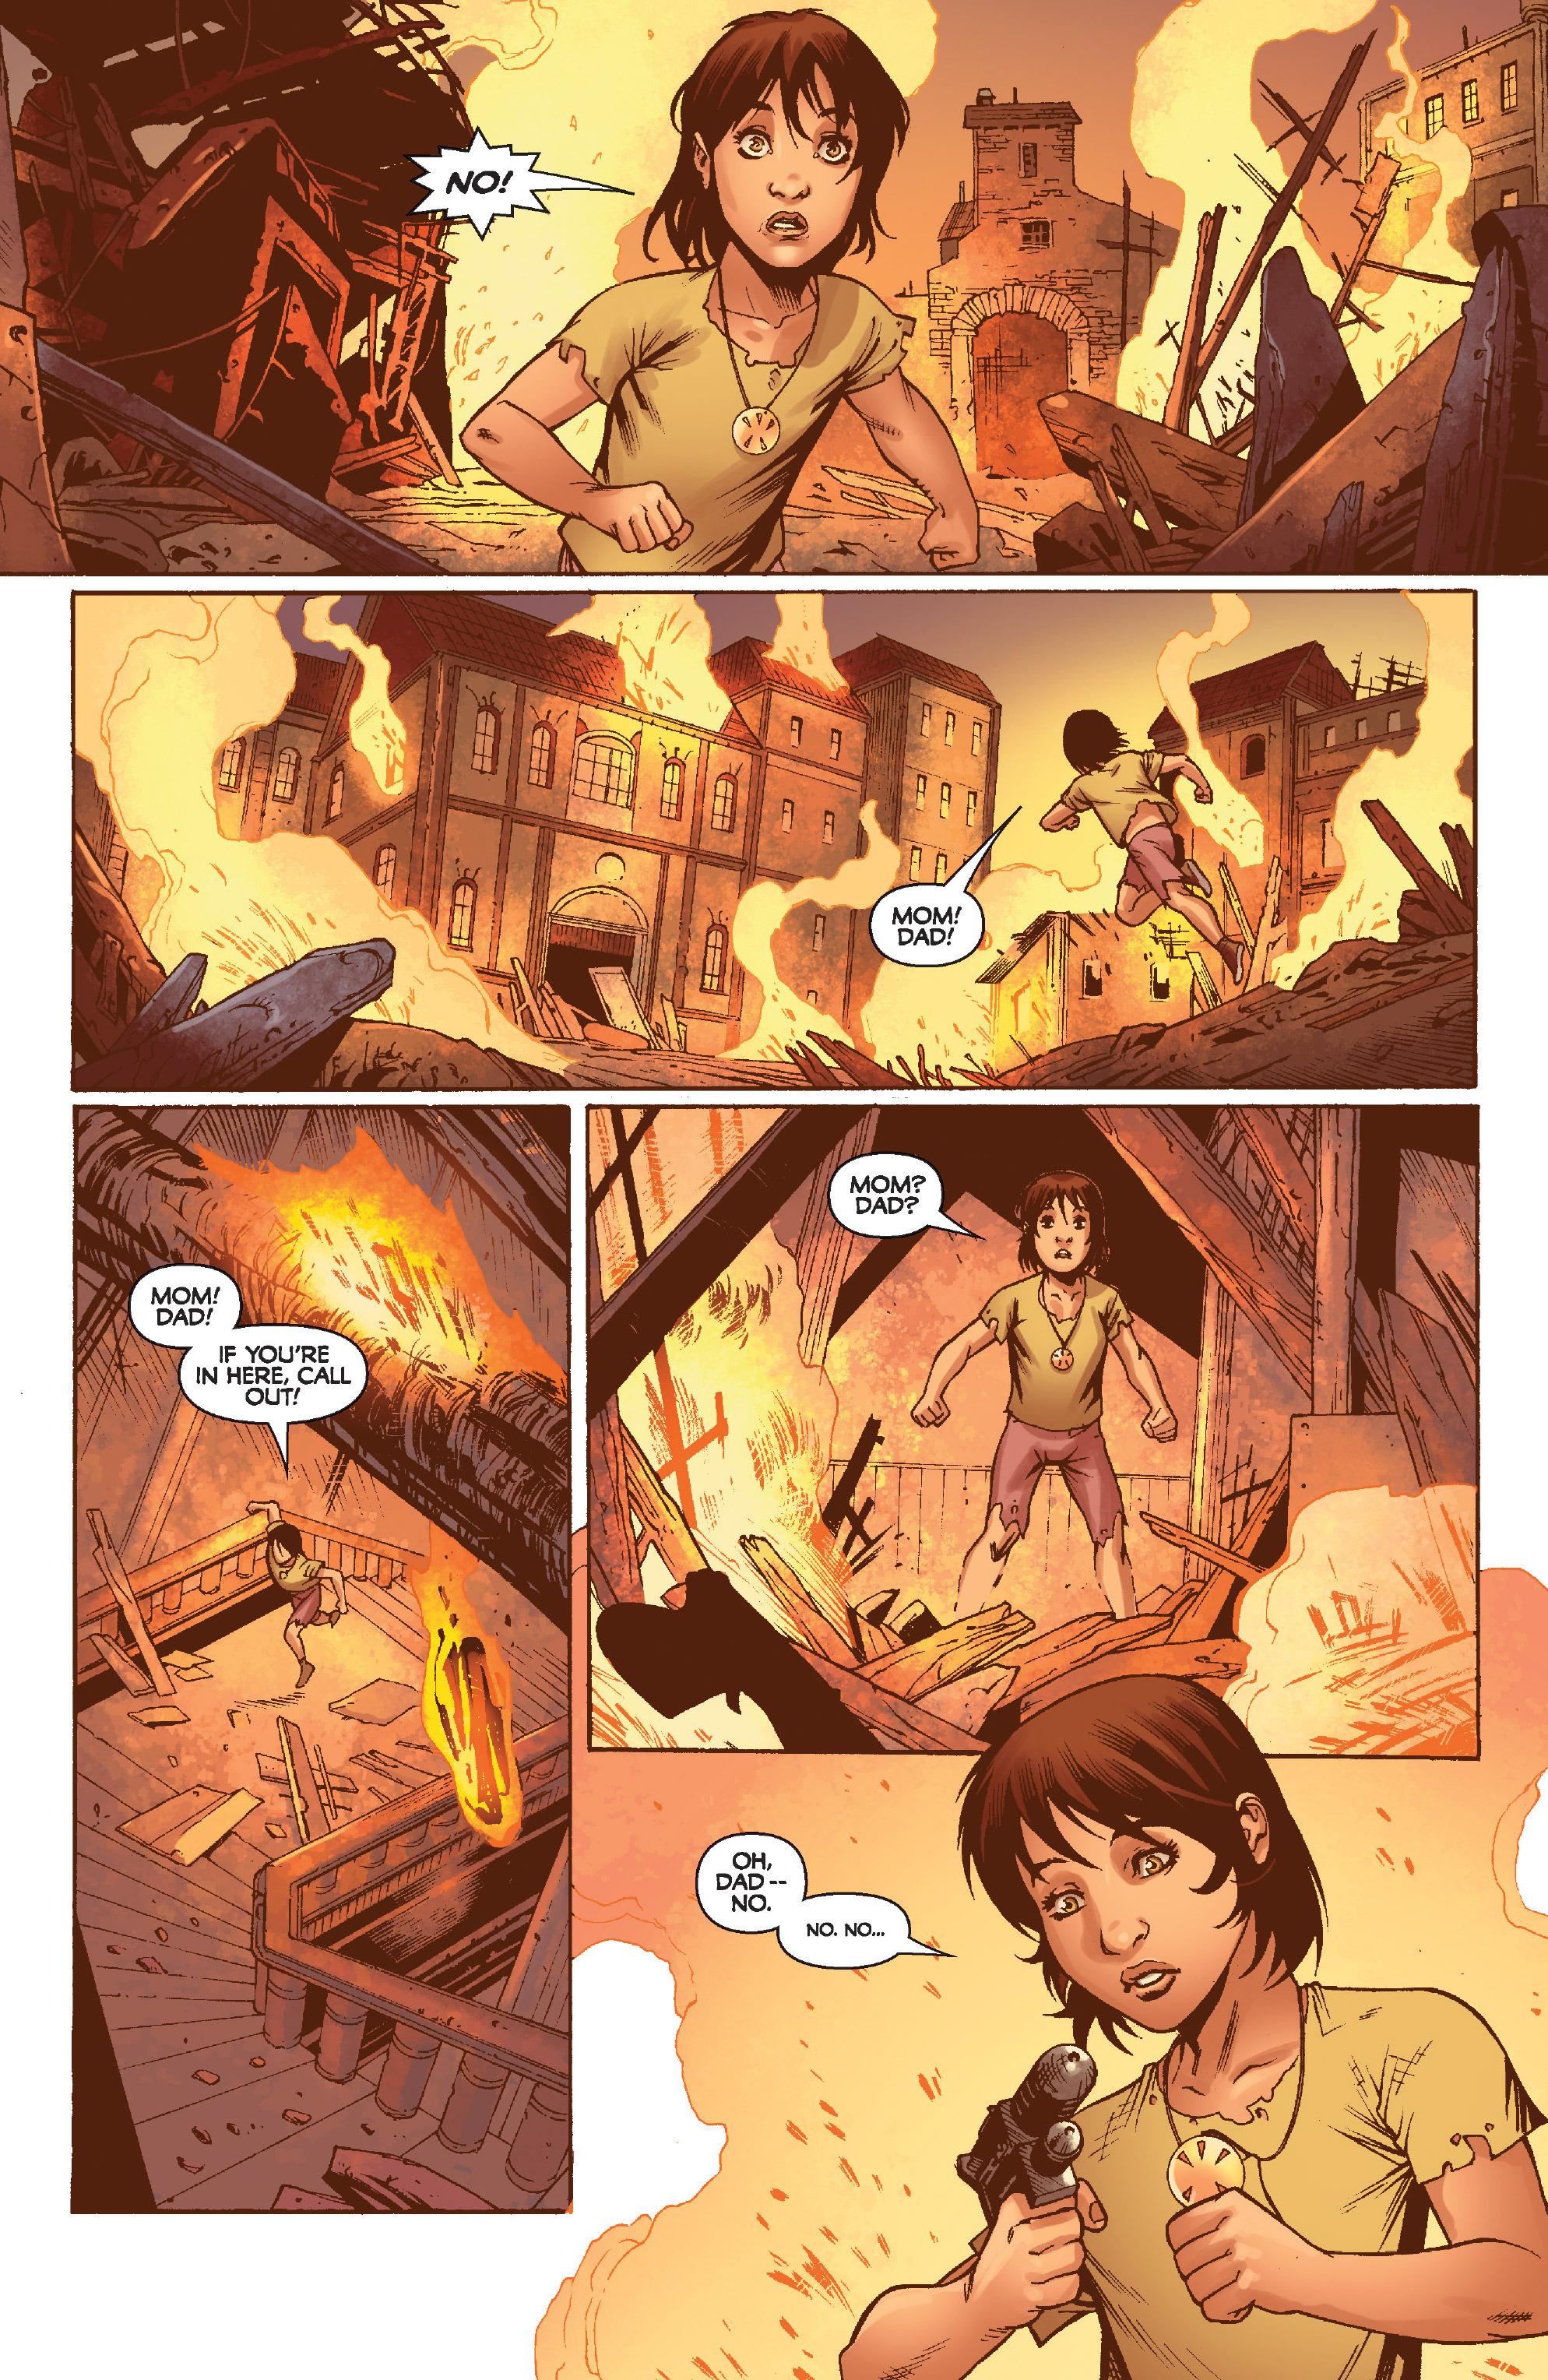 Read online Star Wars: Knight Errant - Escape comic -  Issue #2 - 5